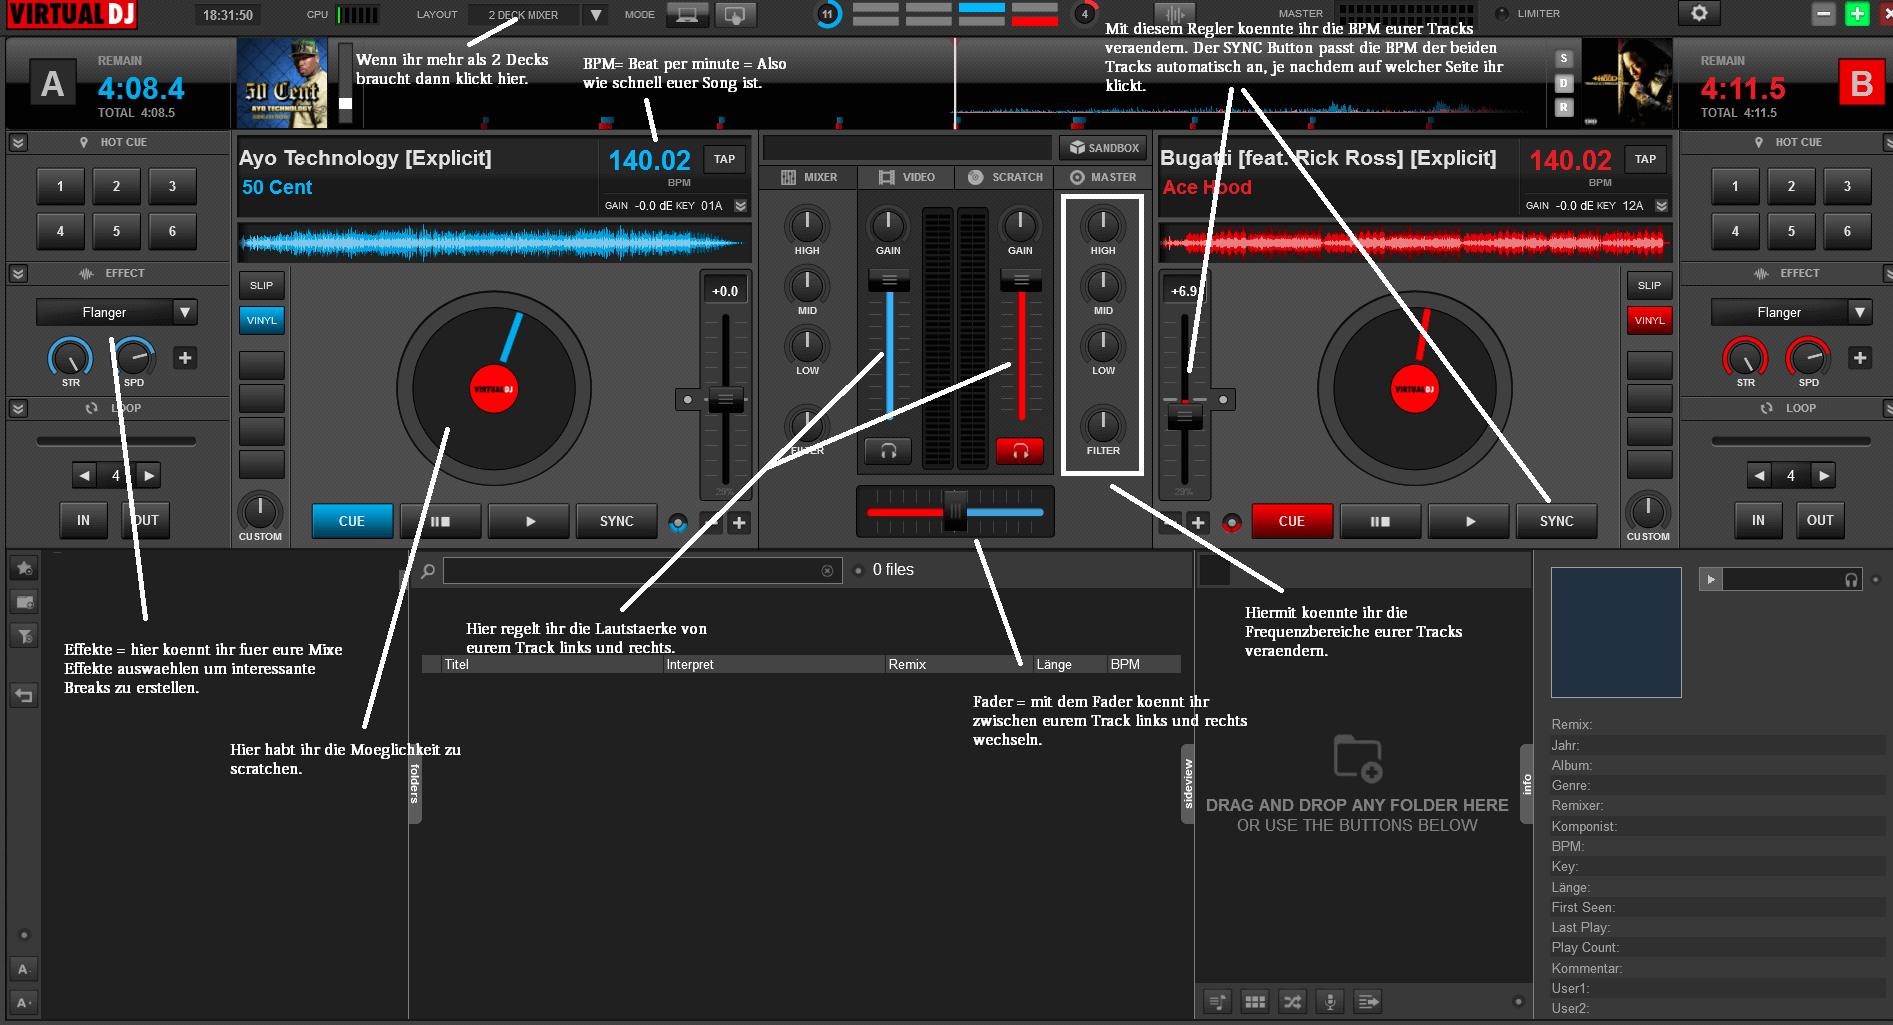 VIRTUAL DJ2